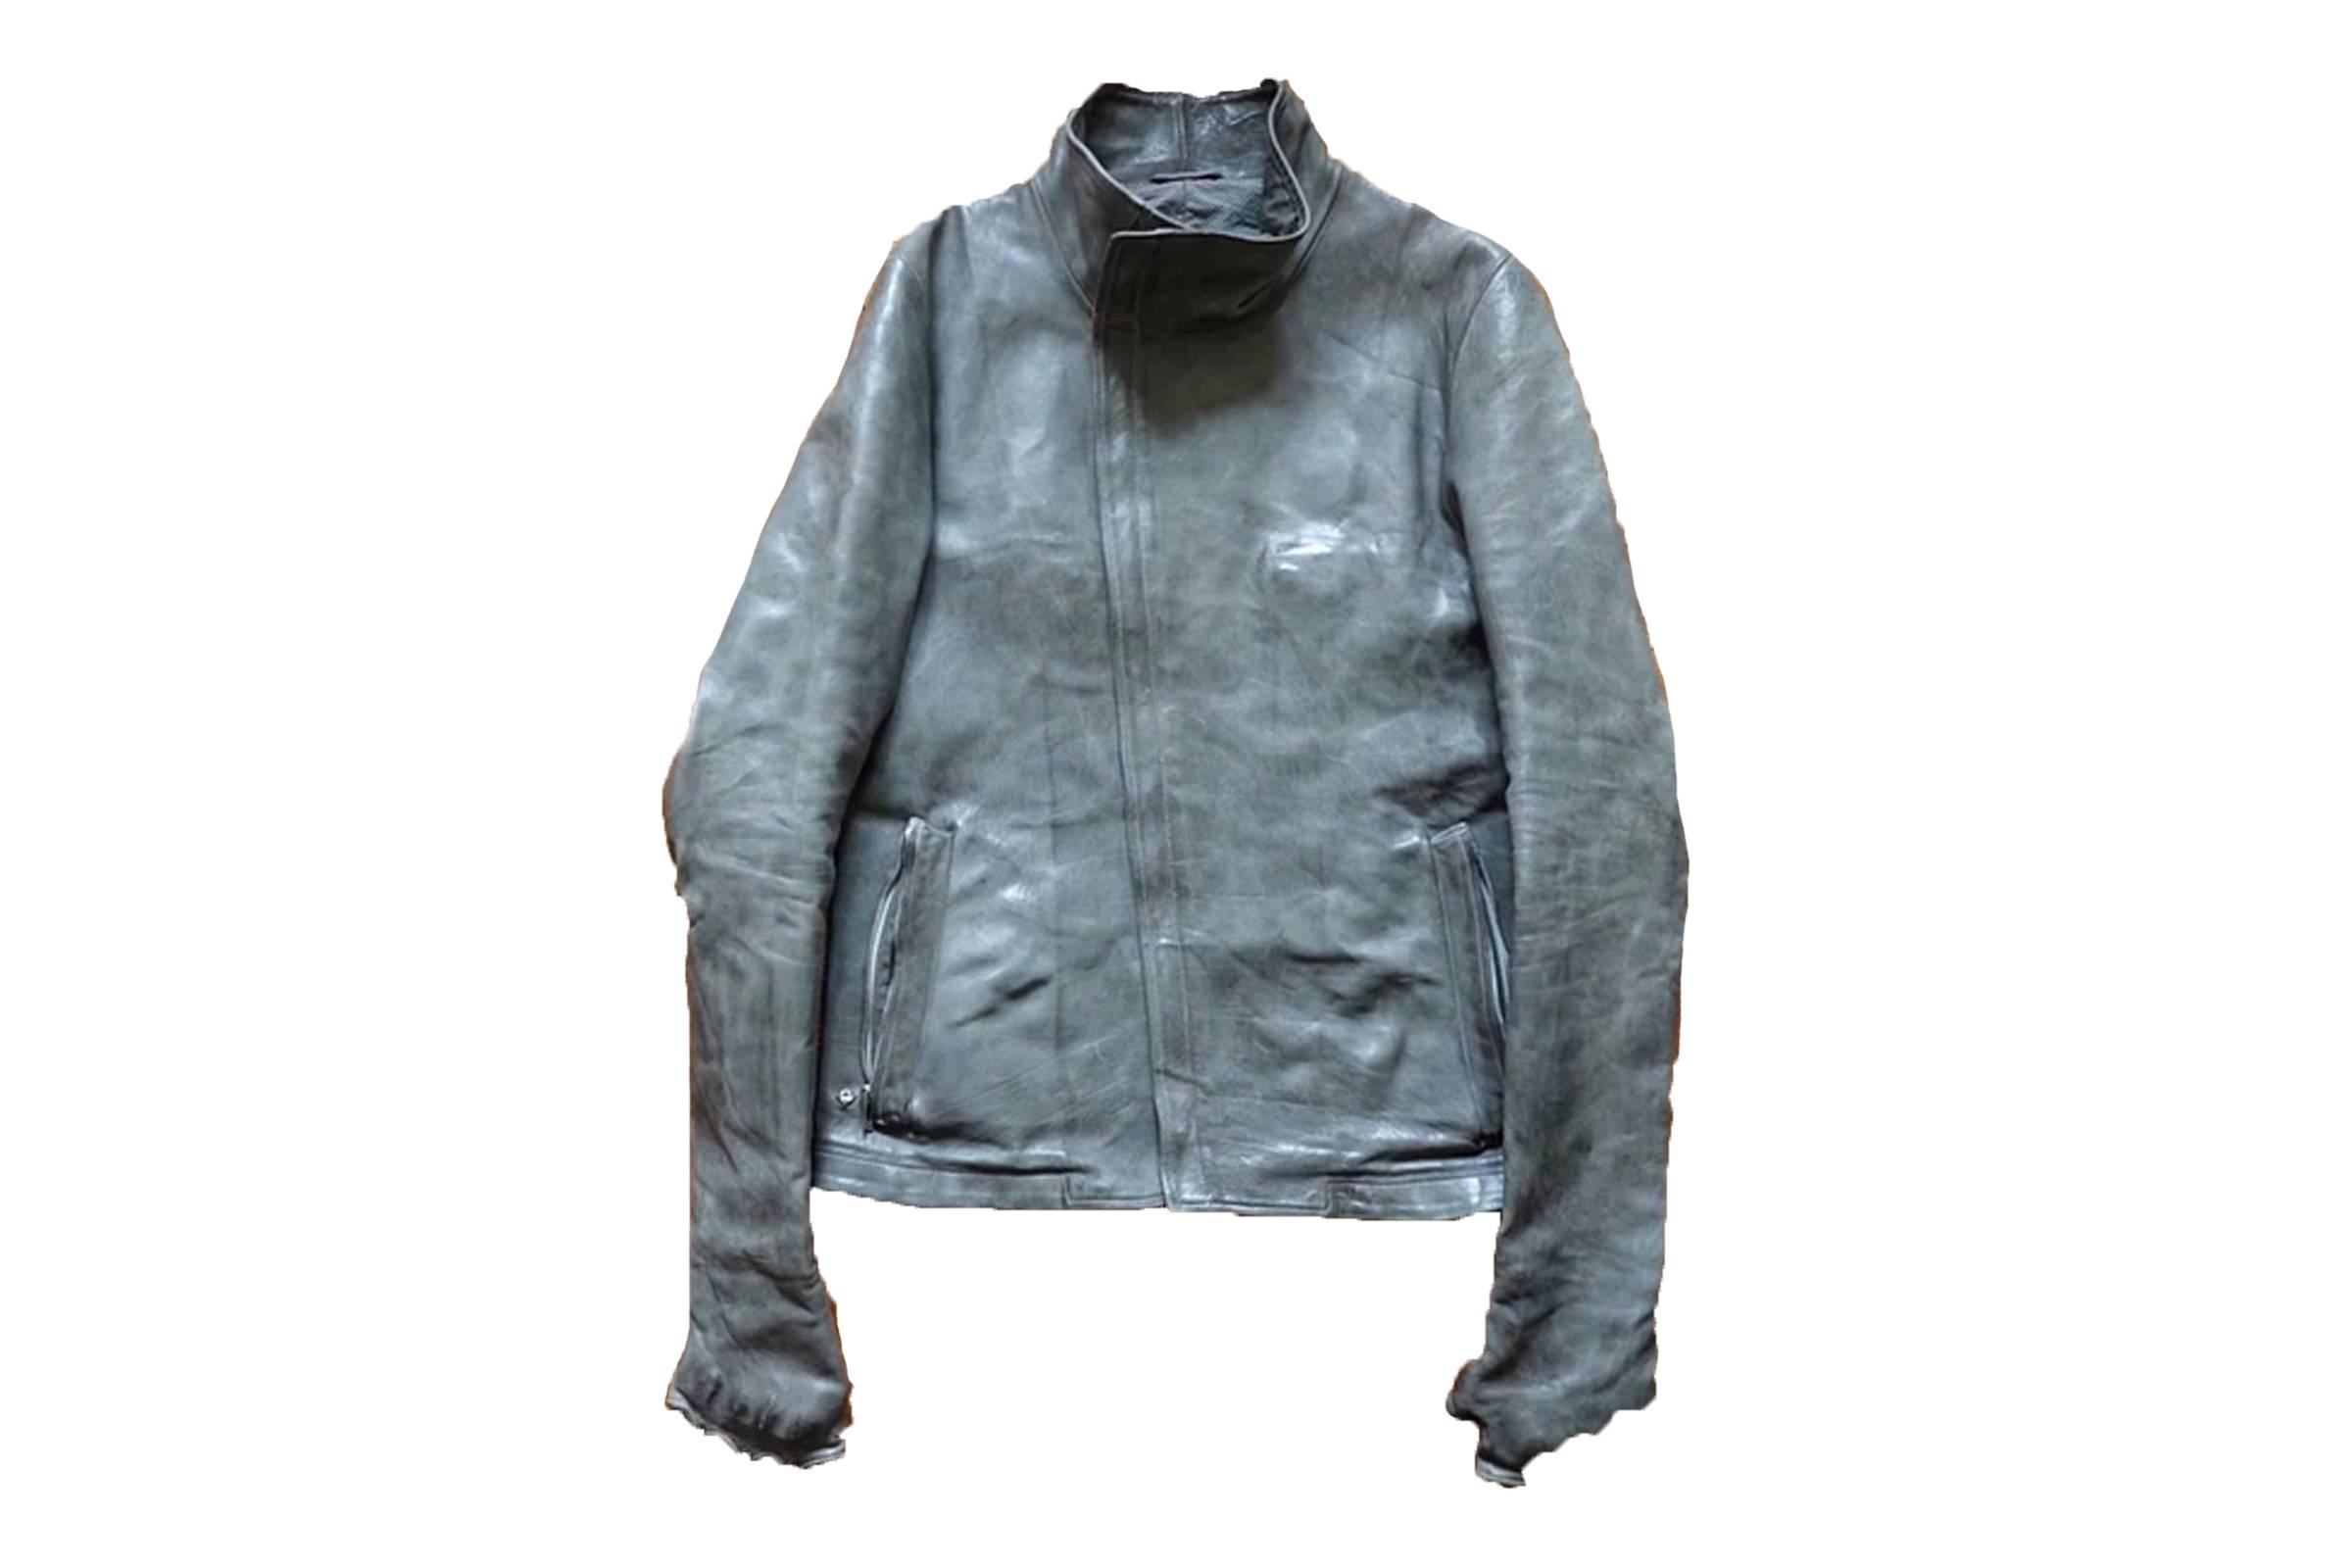 Carol Christian Poell Titanium Gloved Leather Jacket LM/2599G-SP